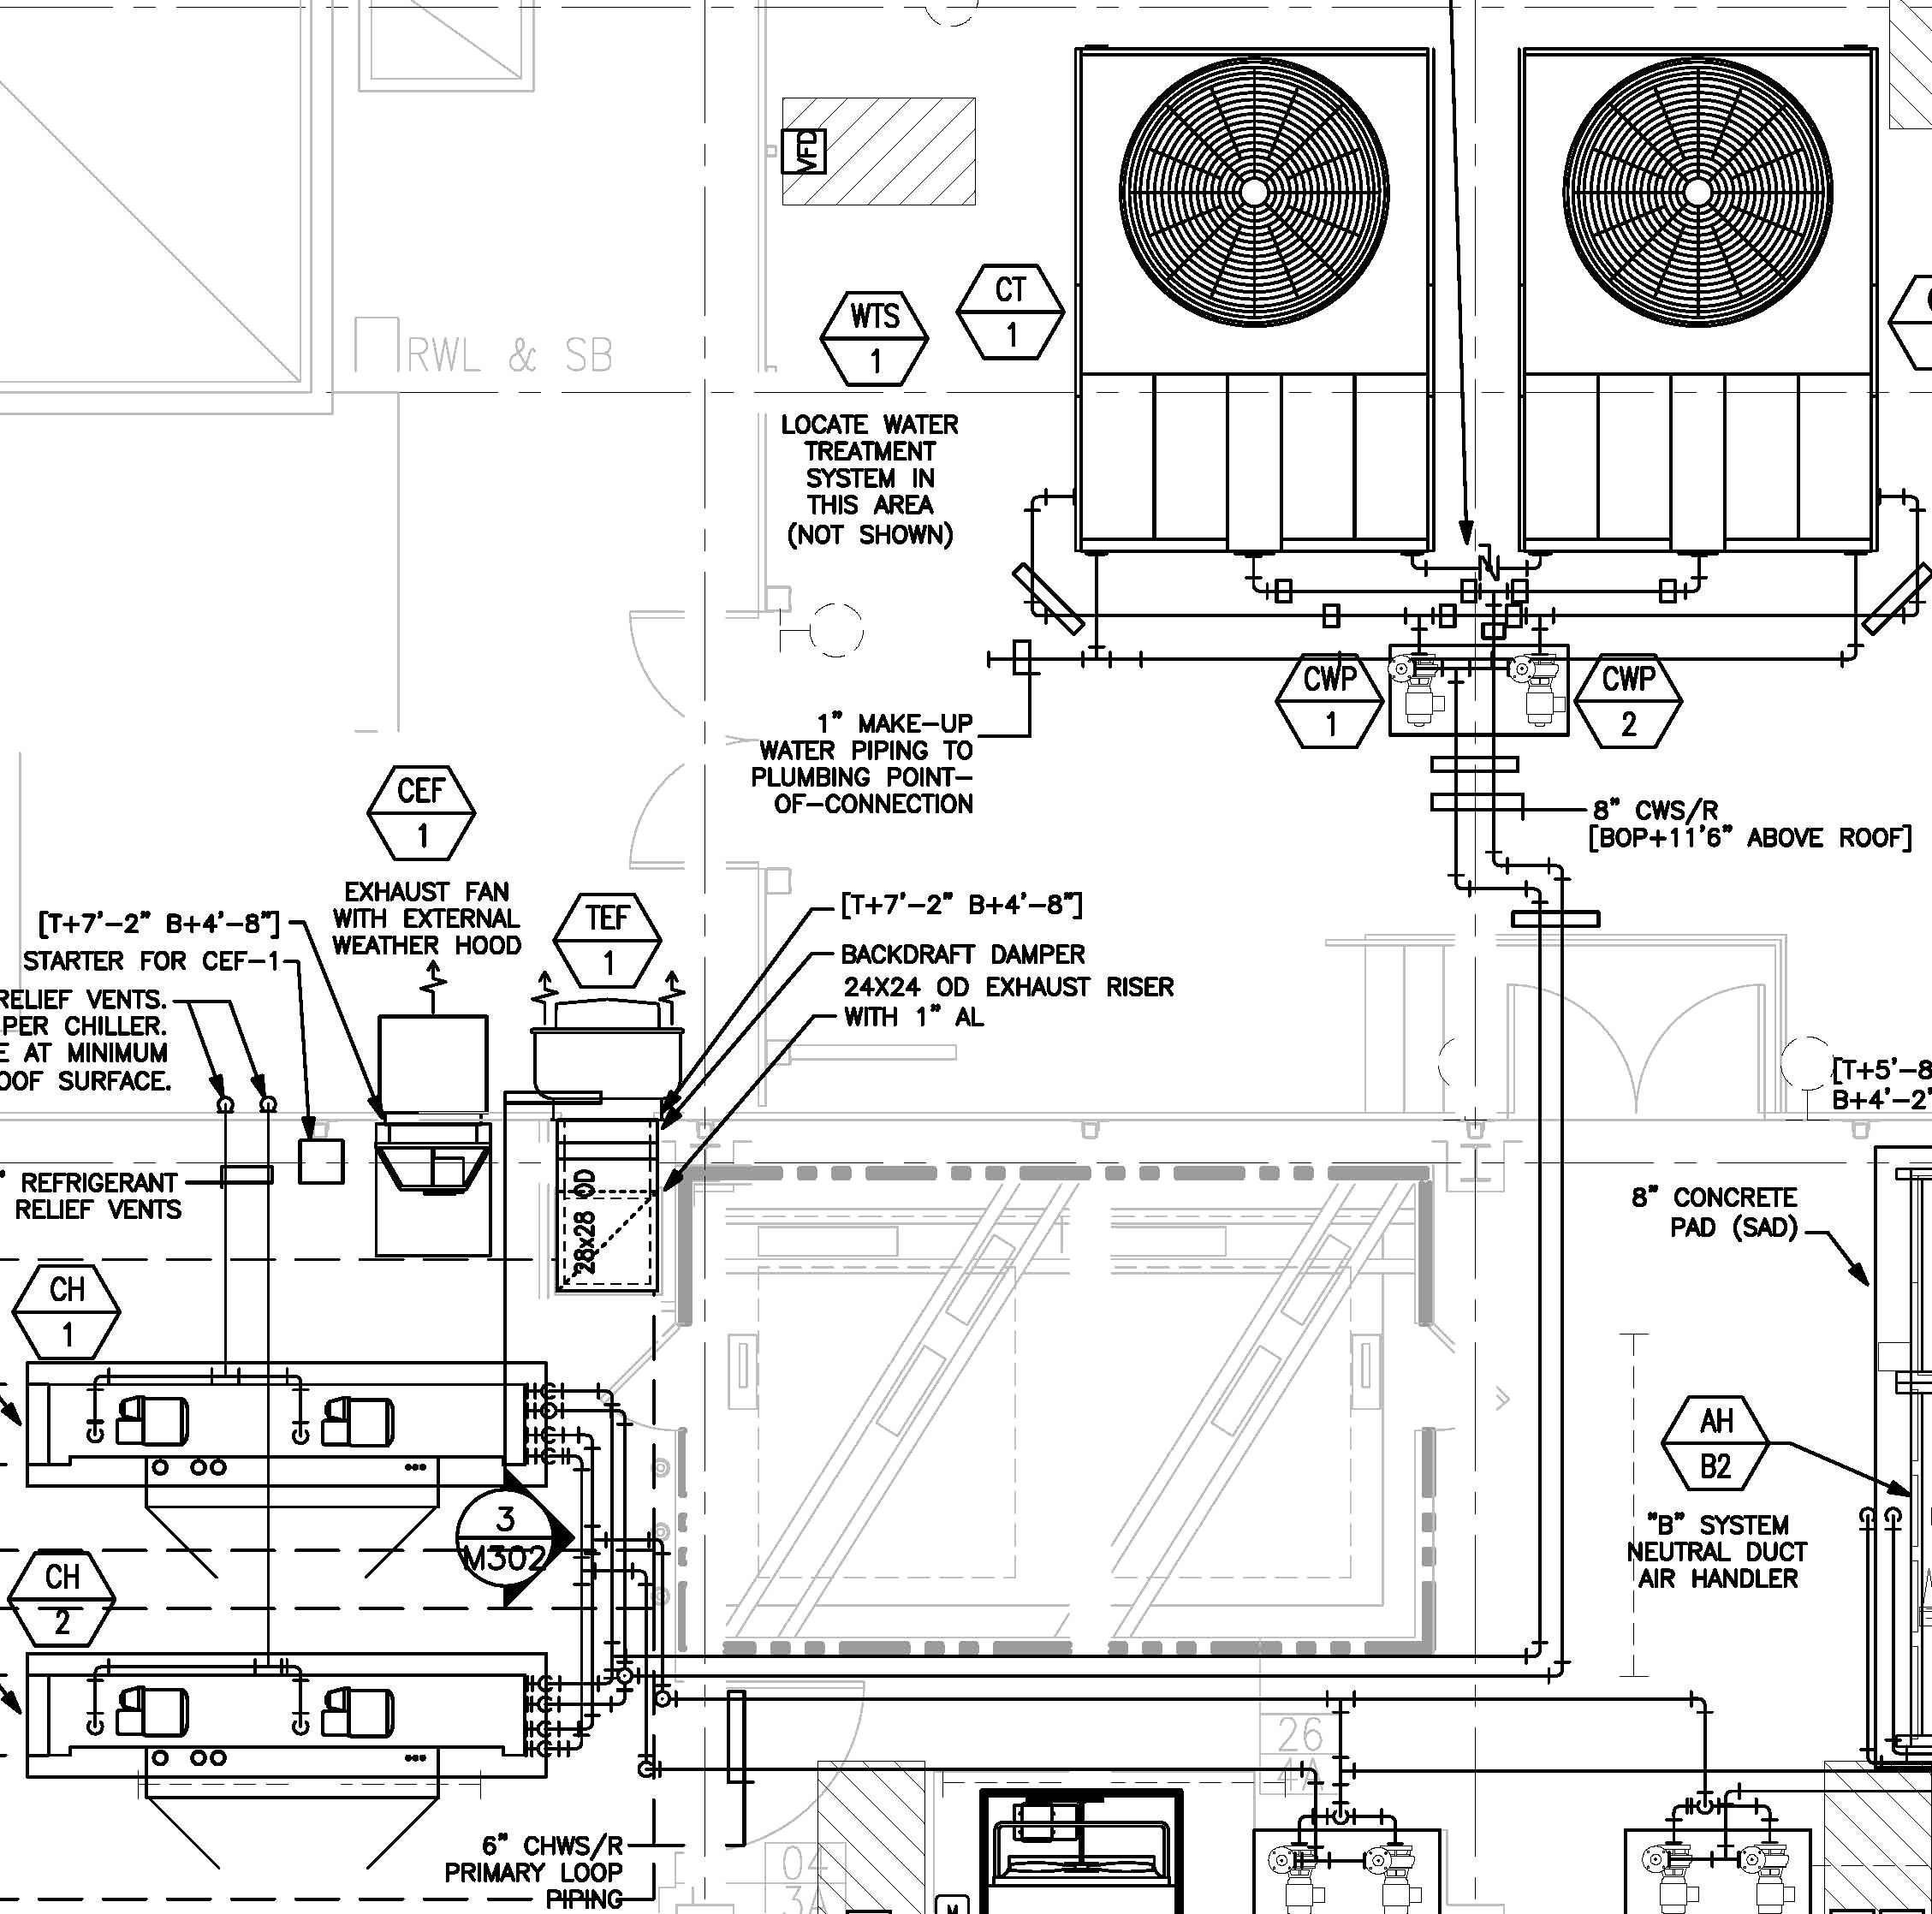 Bmw 325ci Engine Diagram Bmw Wiring Diagram System Wiring Schematics Diagram Of Bmw 325ci Engine Diagram